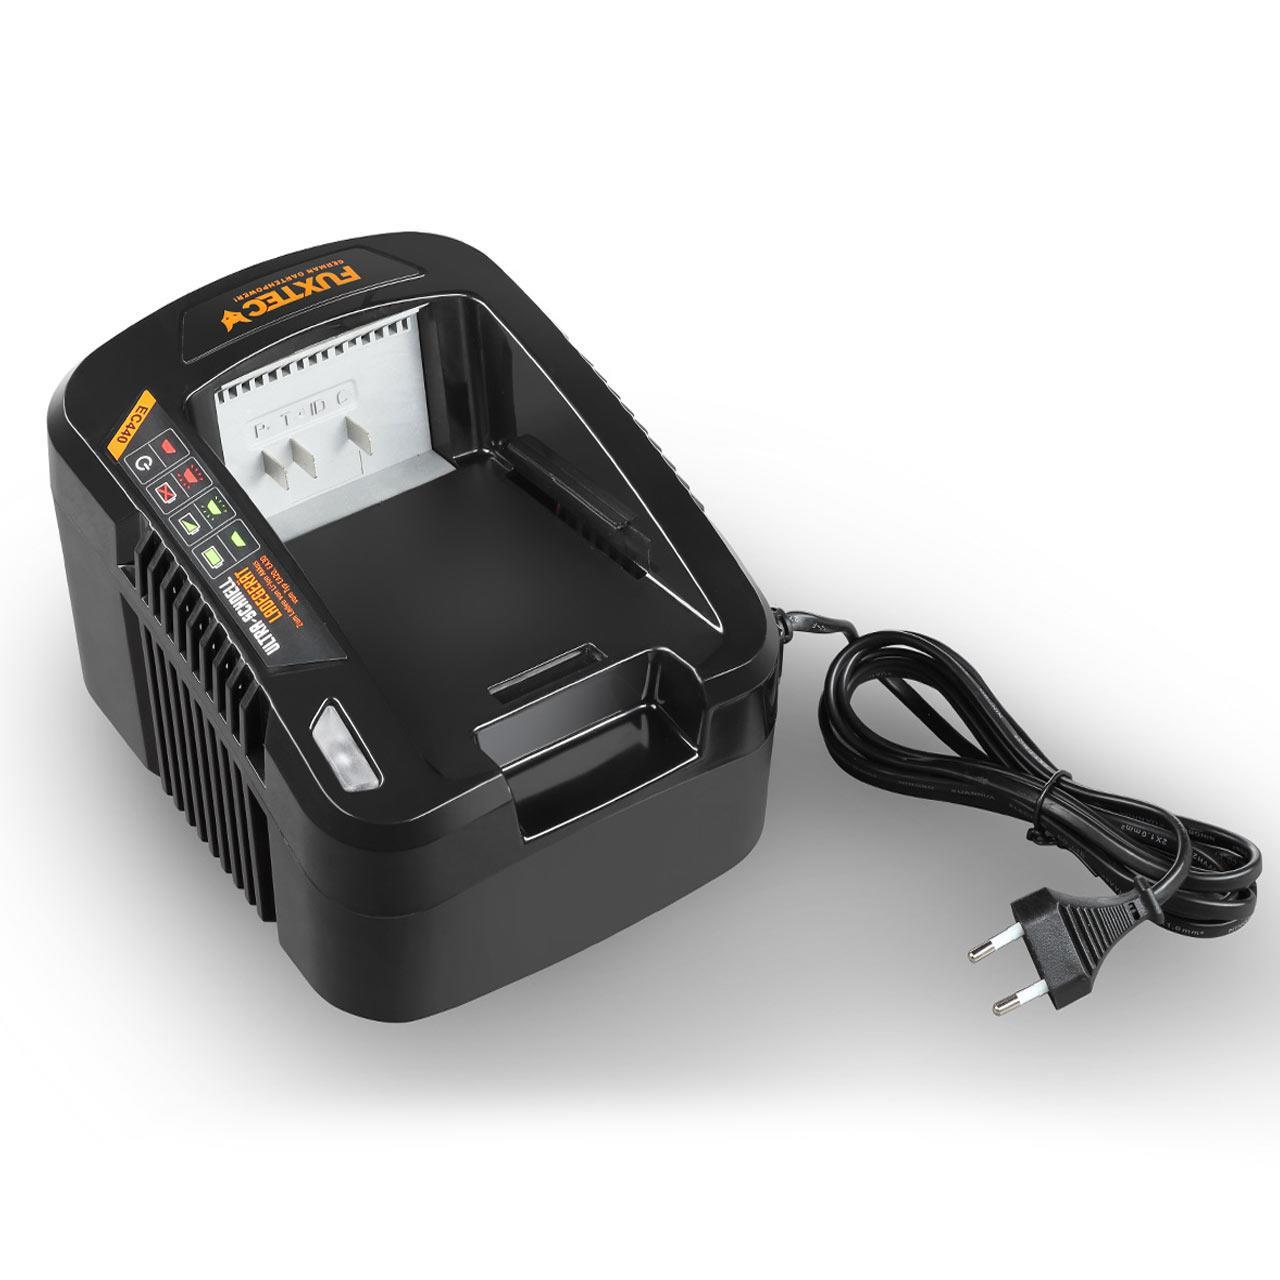 120V 3,5A Ultra-Schnell-Ladegerät EC440 FUXTEC